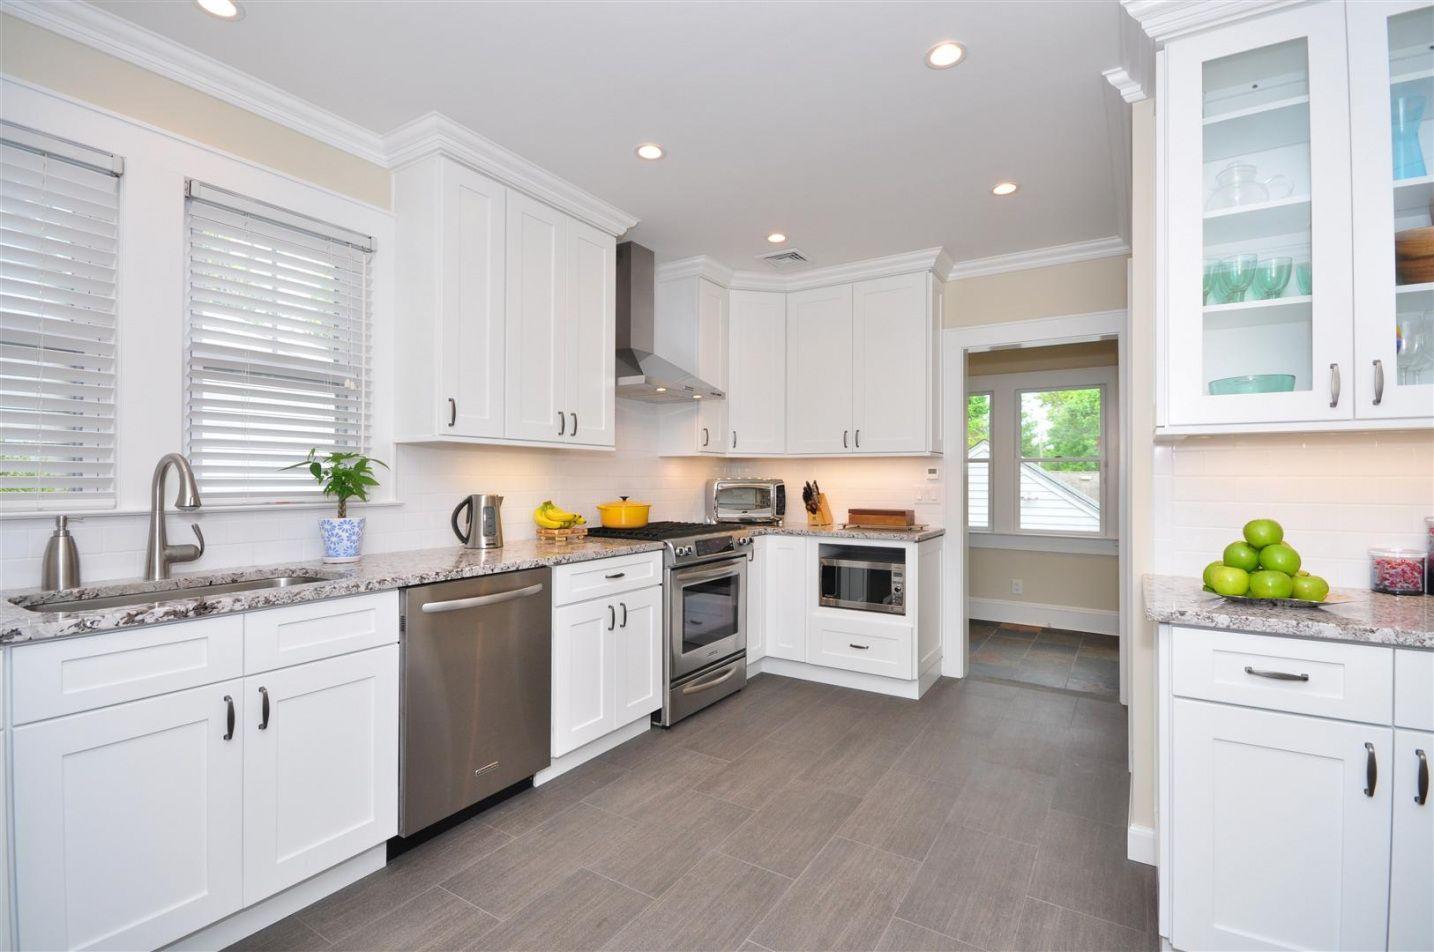 20+ Buy White Kitchen Cabinets - Home Renovation Ideas Kitchen Check ...